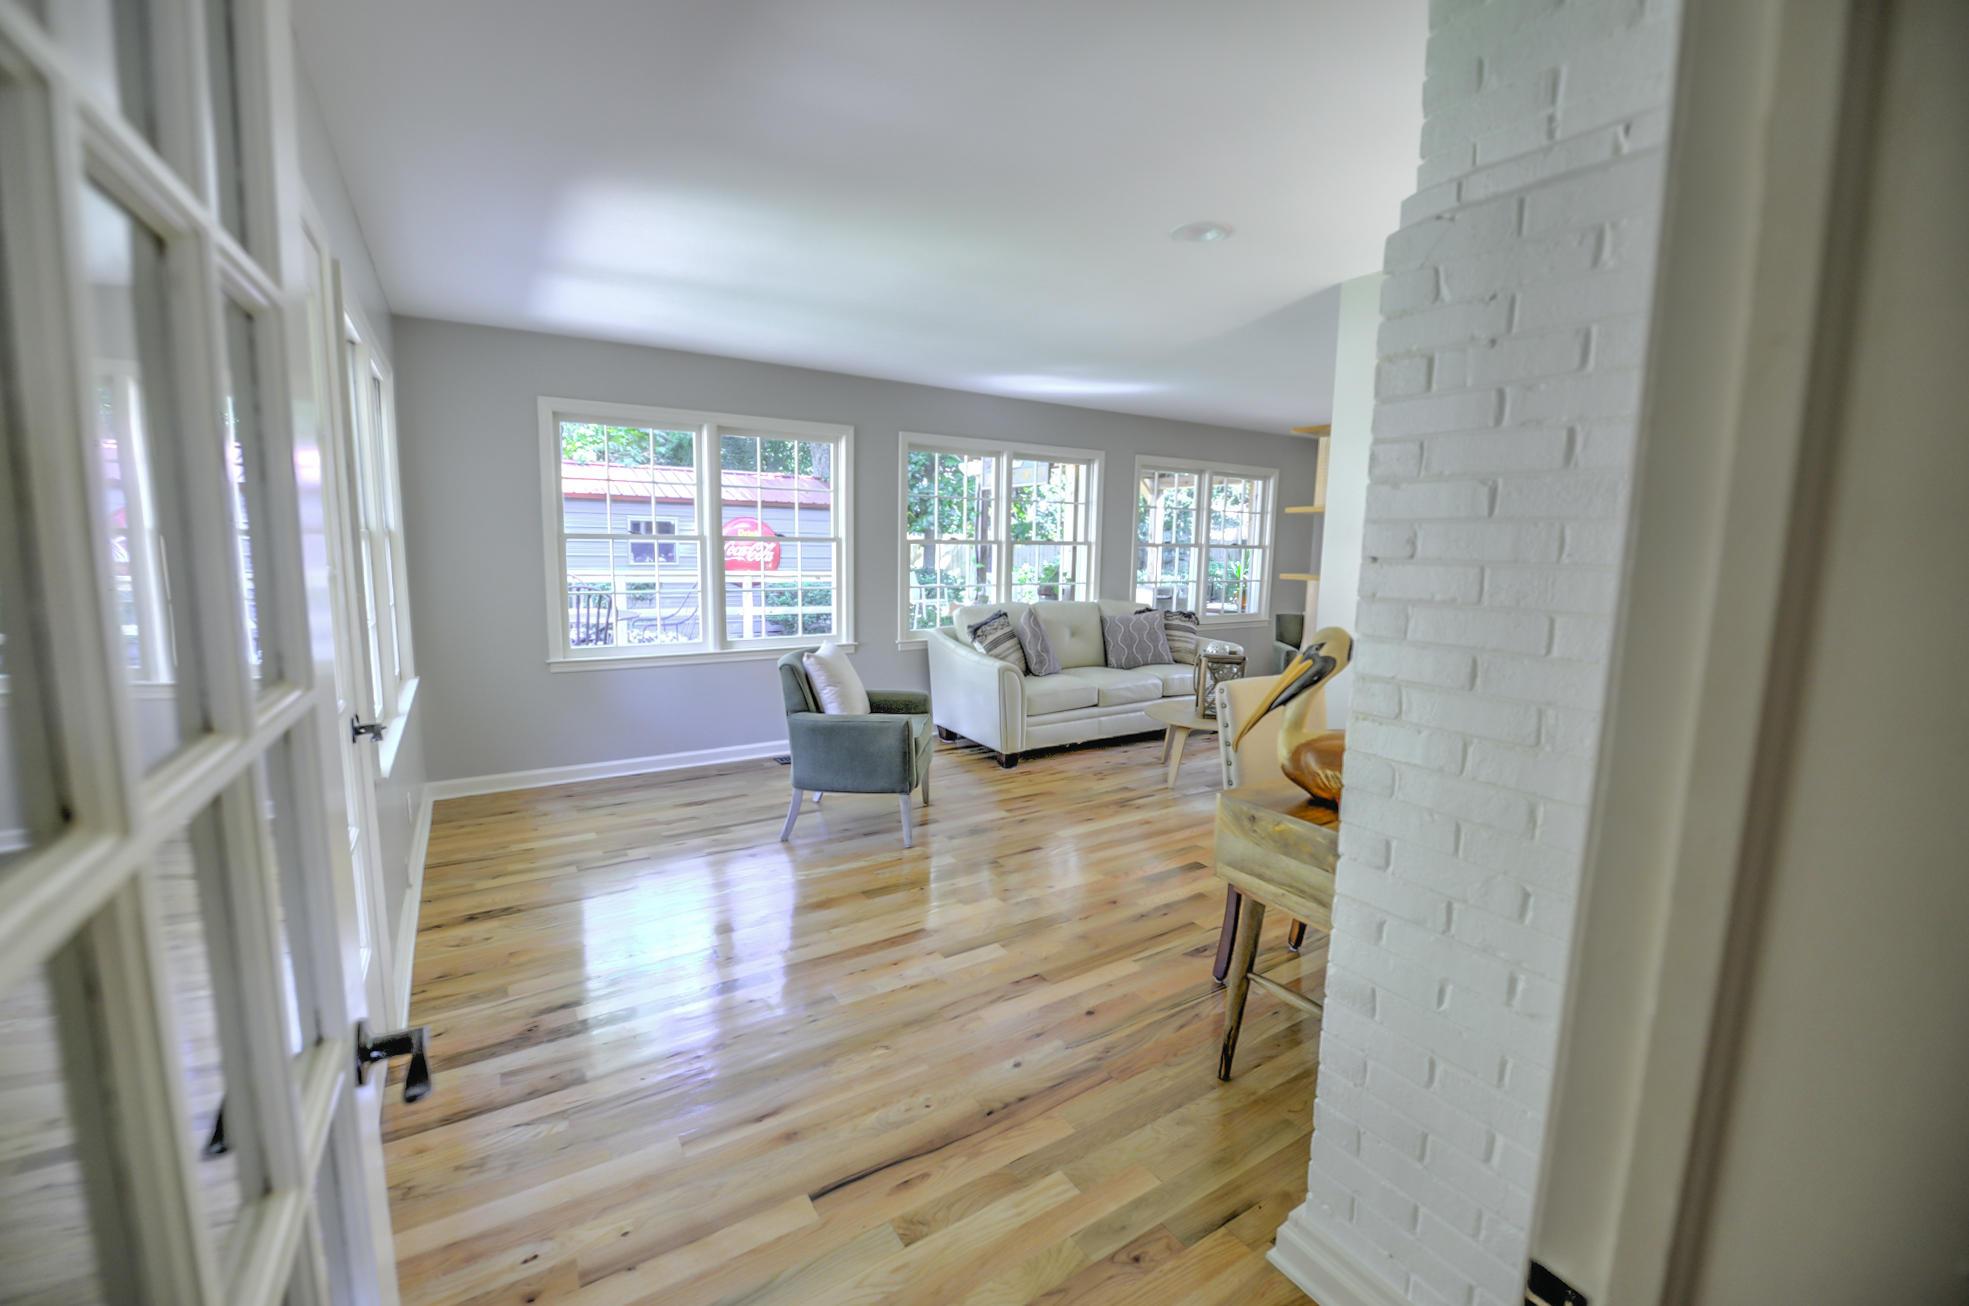 Shemwood II Homes For Sale - 1017 Jack Snipe, Mount Pleasant, SC - 18